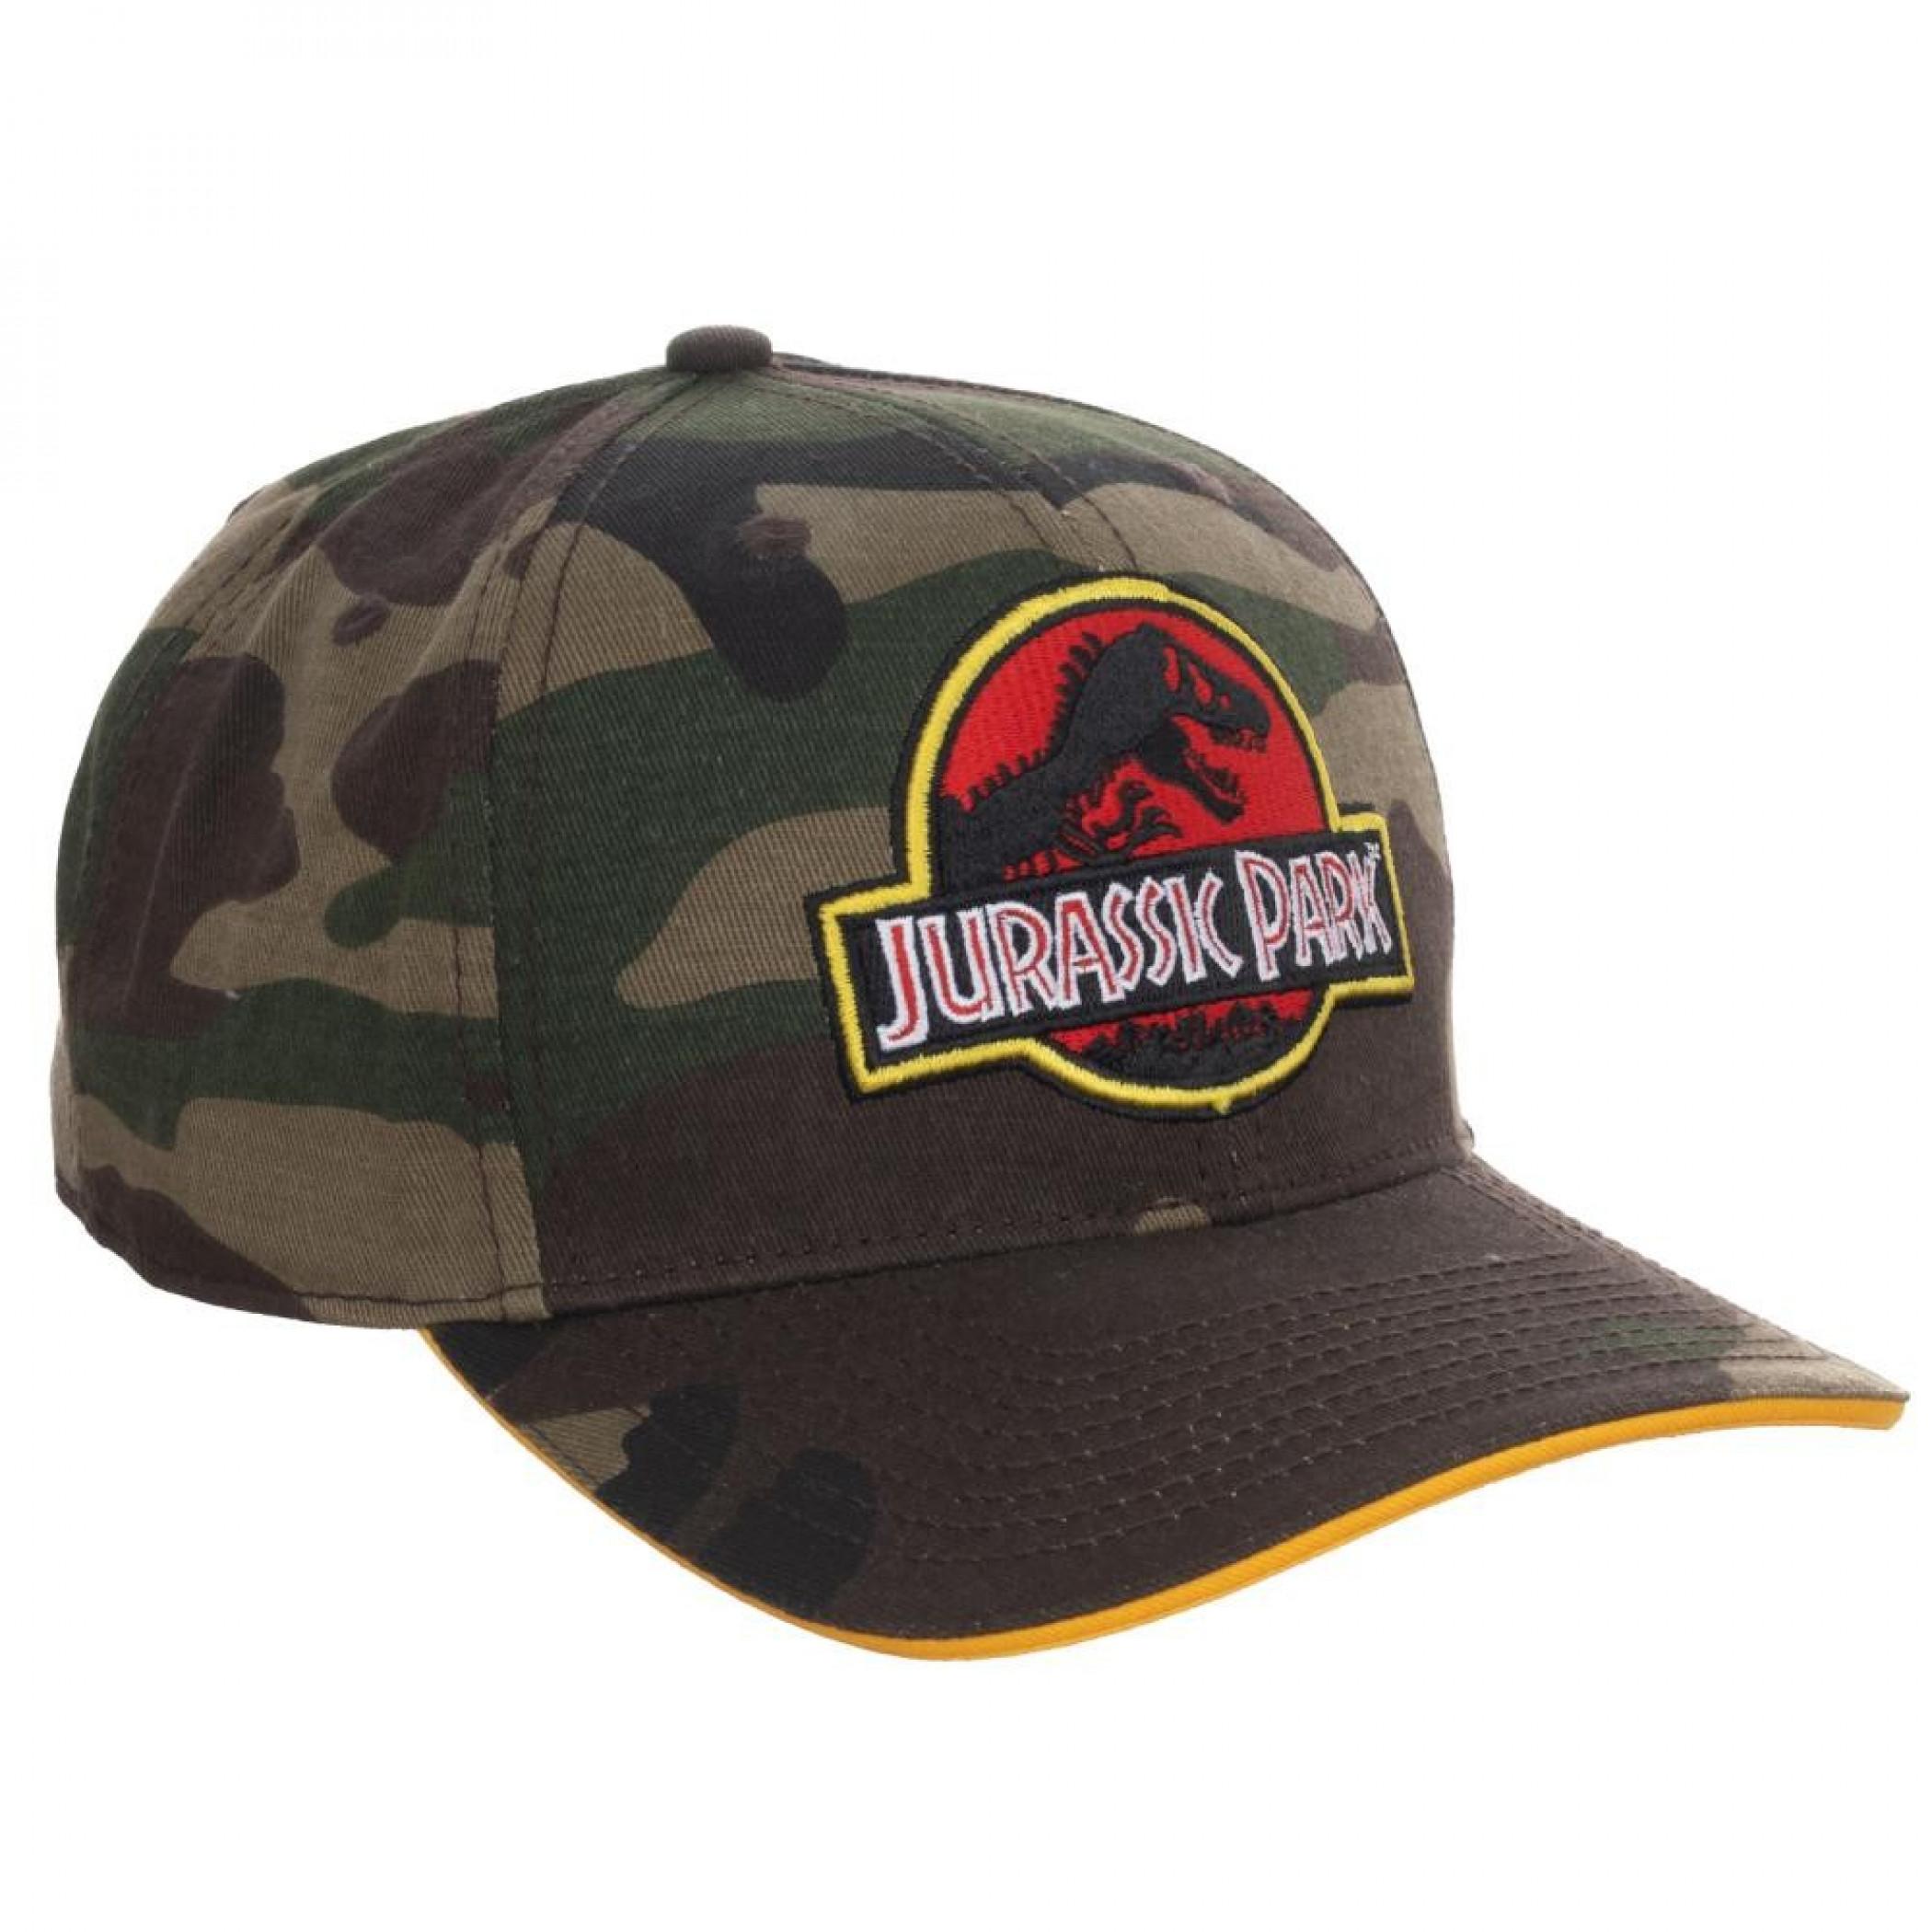 Jurassic Park Camo Adjustable Snapback Hat